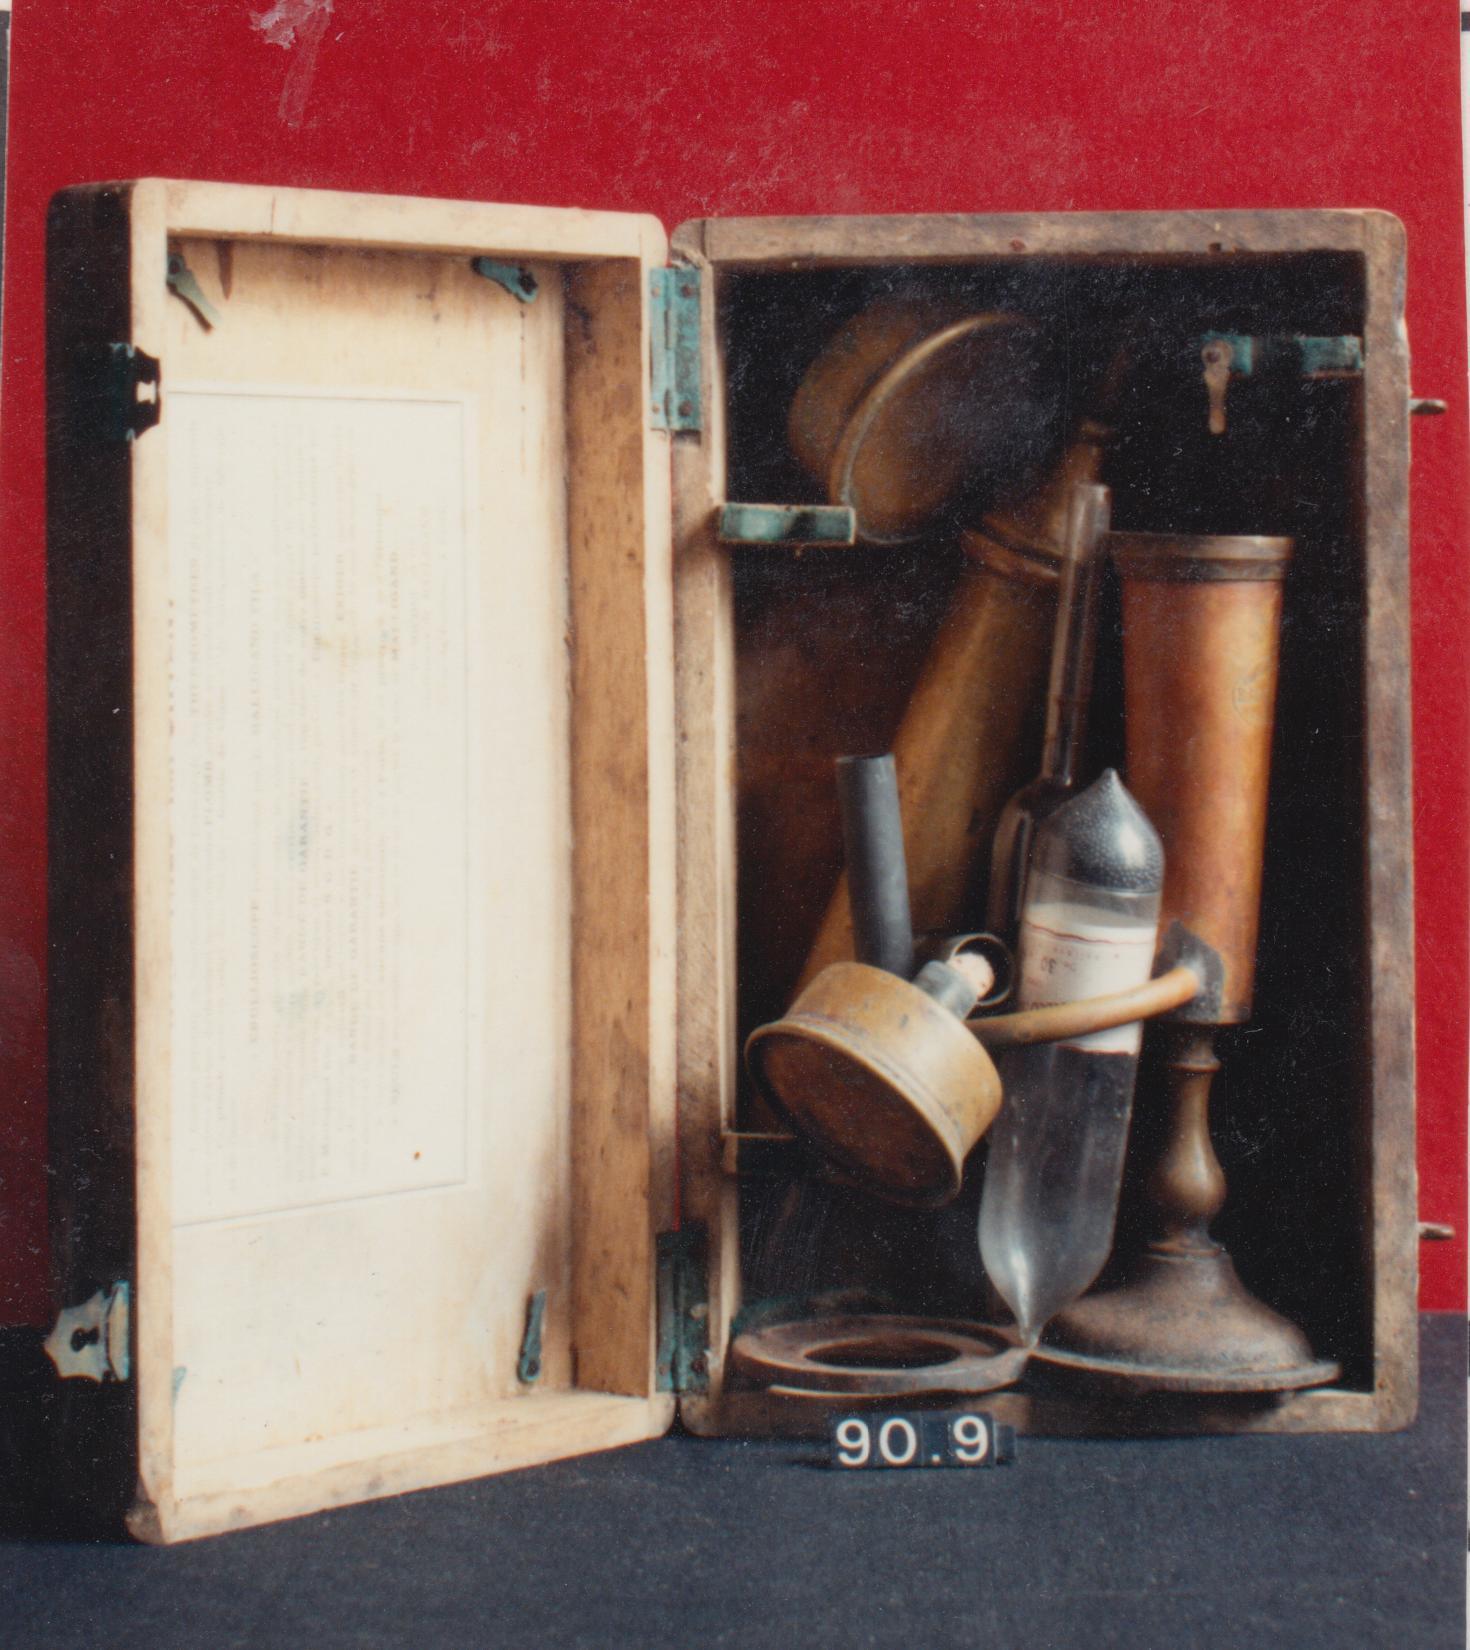 Ebulloscopio de Malligand